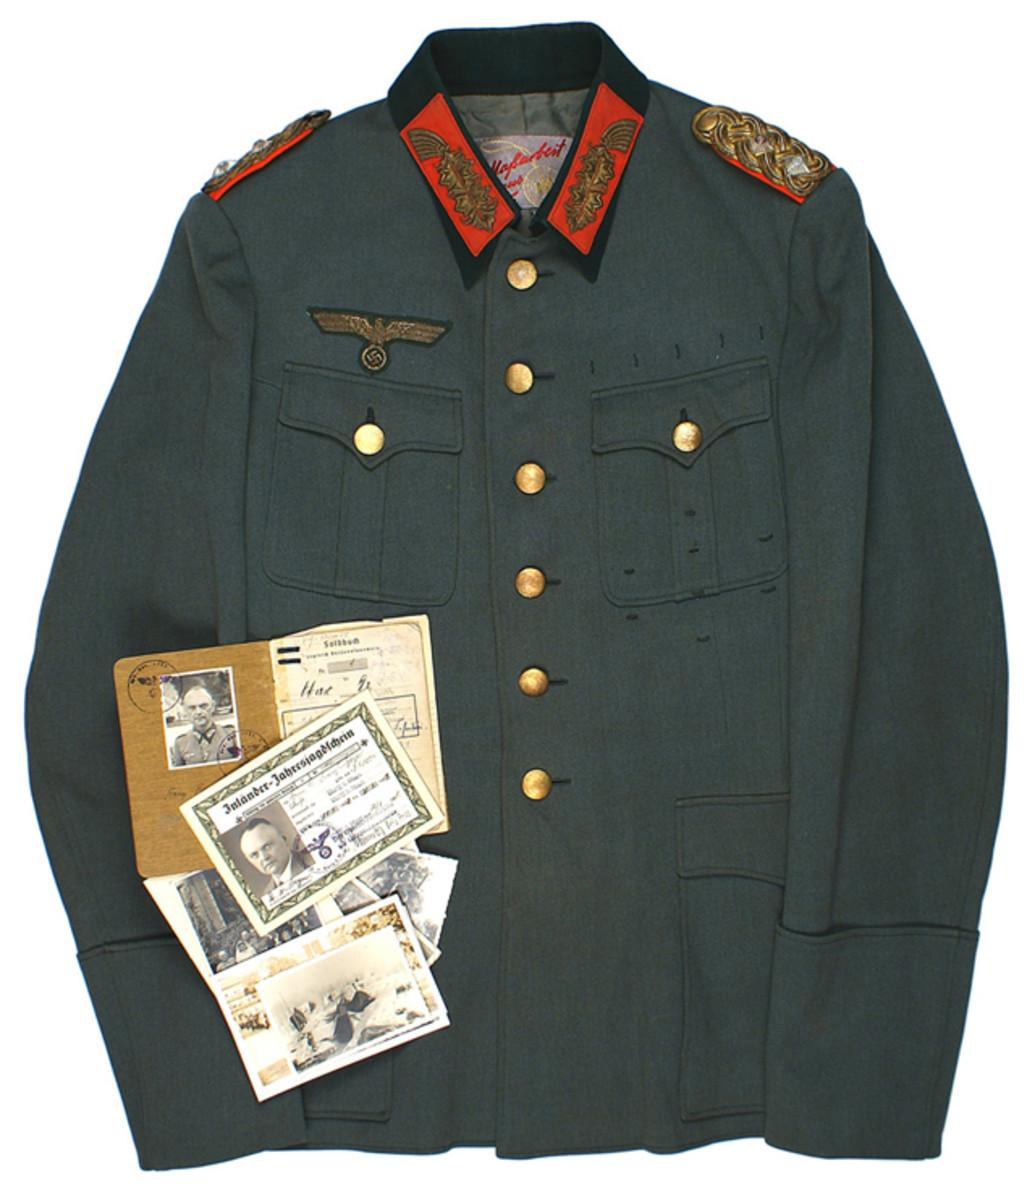 Important grouping of items from German Gen. Lt. Dr. Franz Beyer, World War II ($10,012).